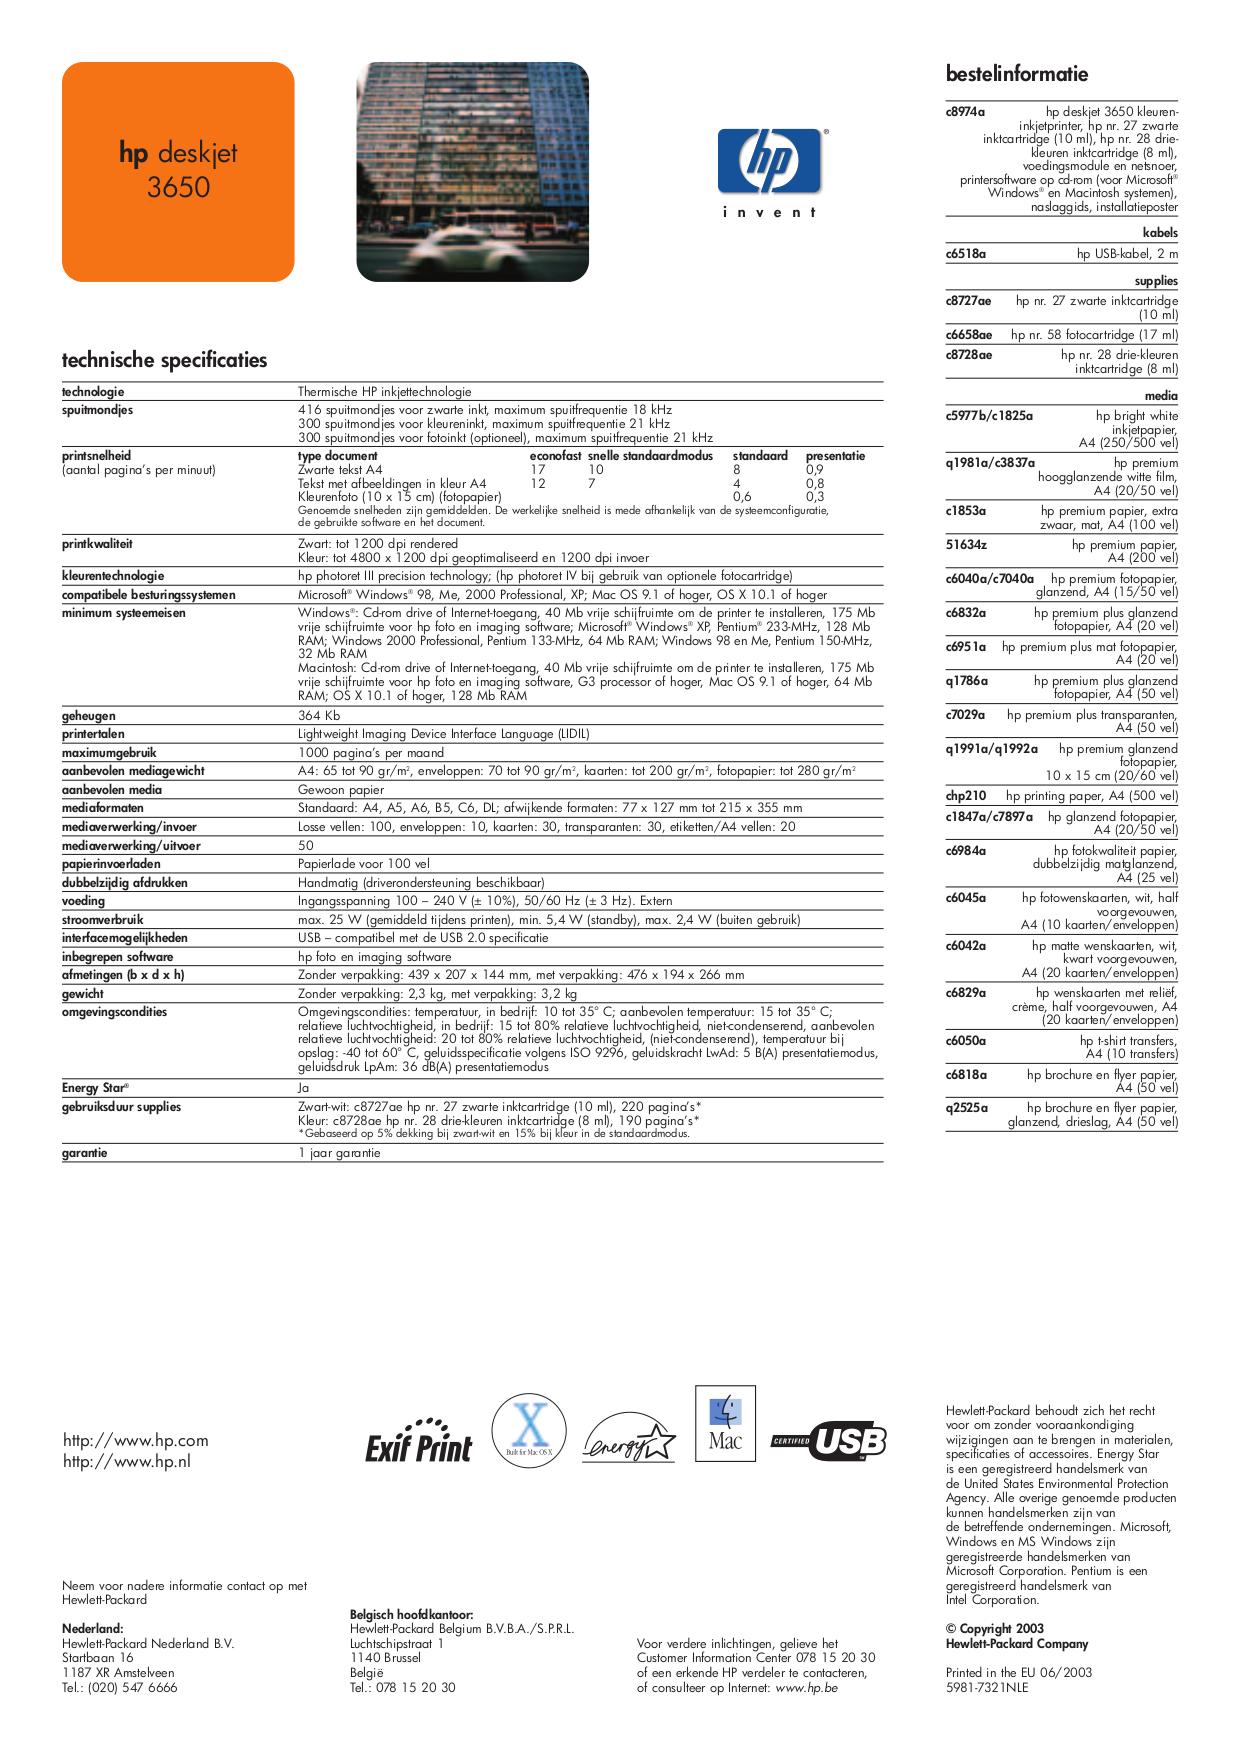 Download free driver for hp deskjet 3650 inkjet | en. Rellenado.